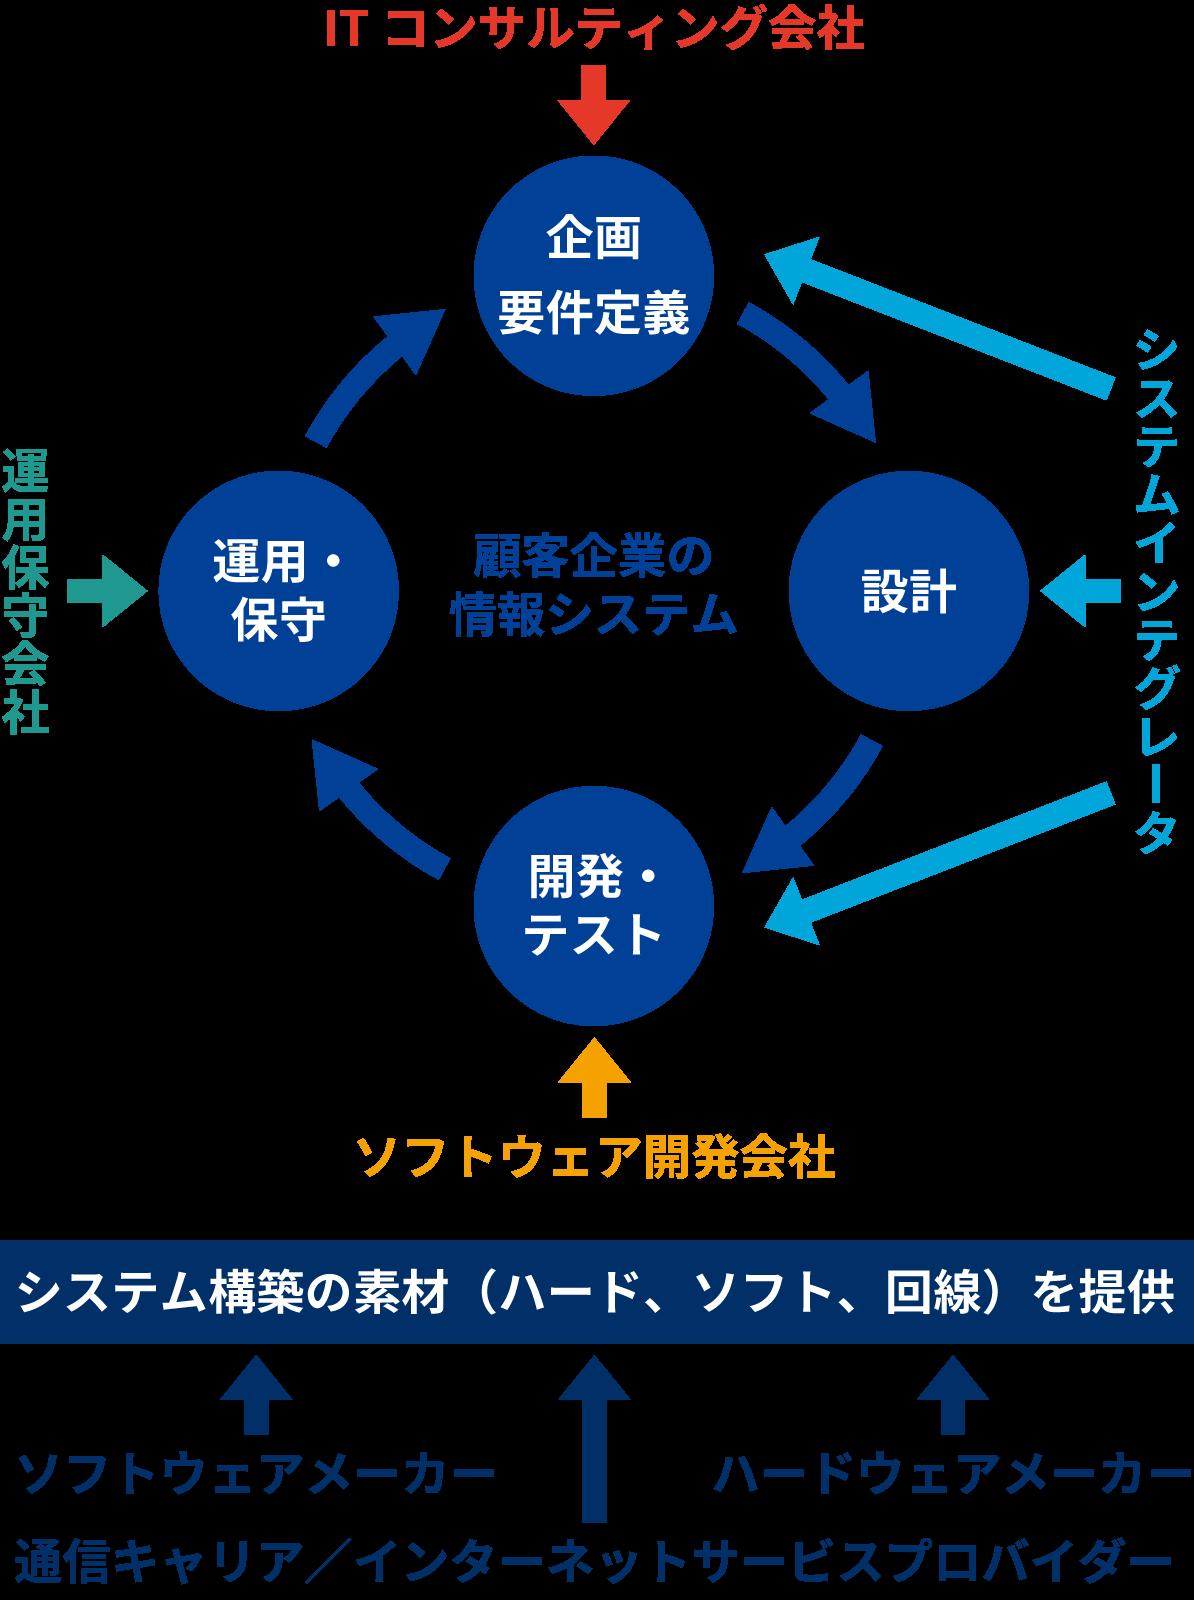 IT業界の構造と役割分担